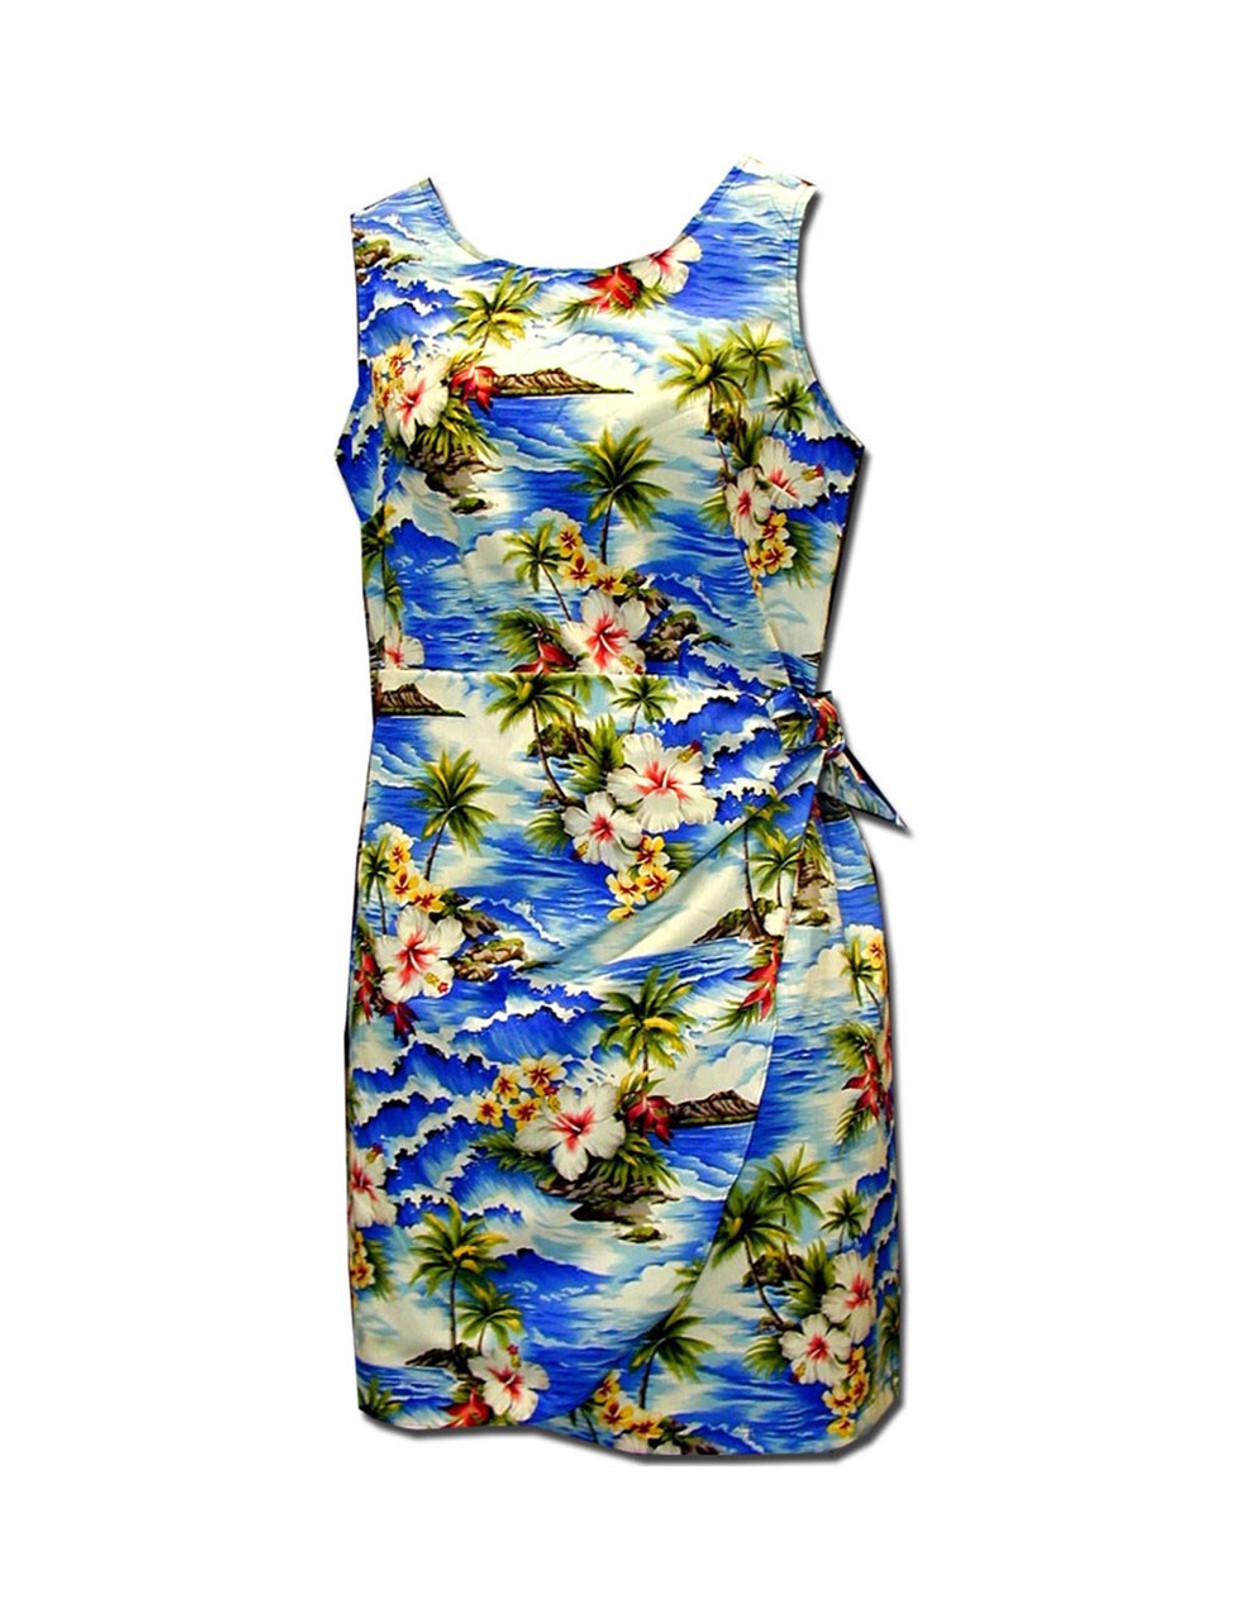 e66a213e1478 Hookipa Hibiscus Girls Aloha Sarong Dress 100% Cotton Fabric Tank Shoulder  Straps Adjustable Waist Sarong